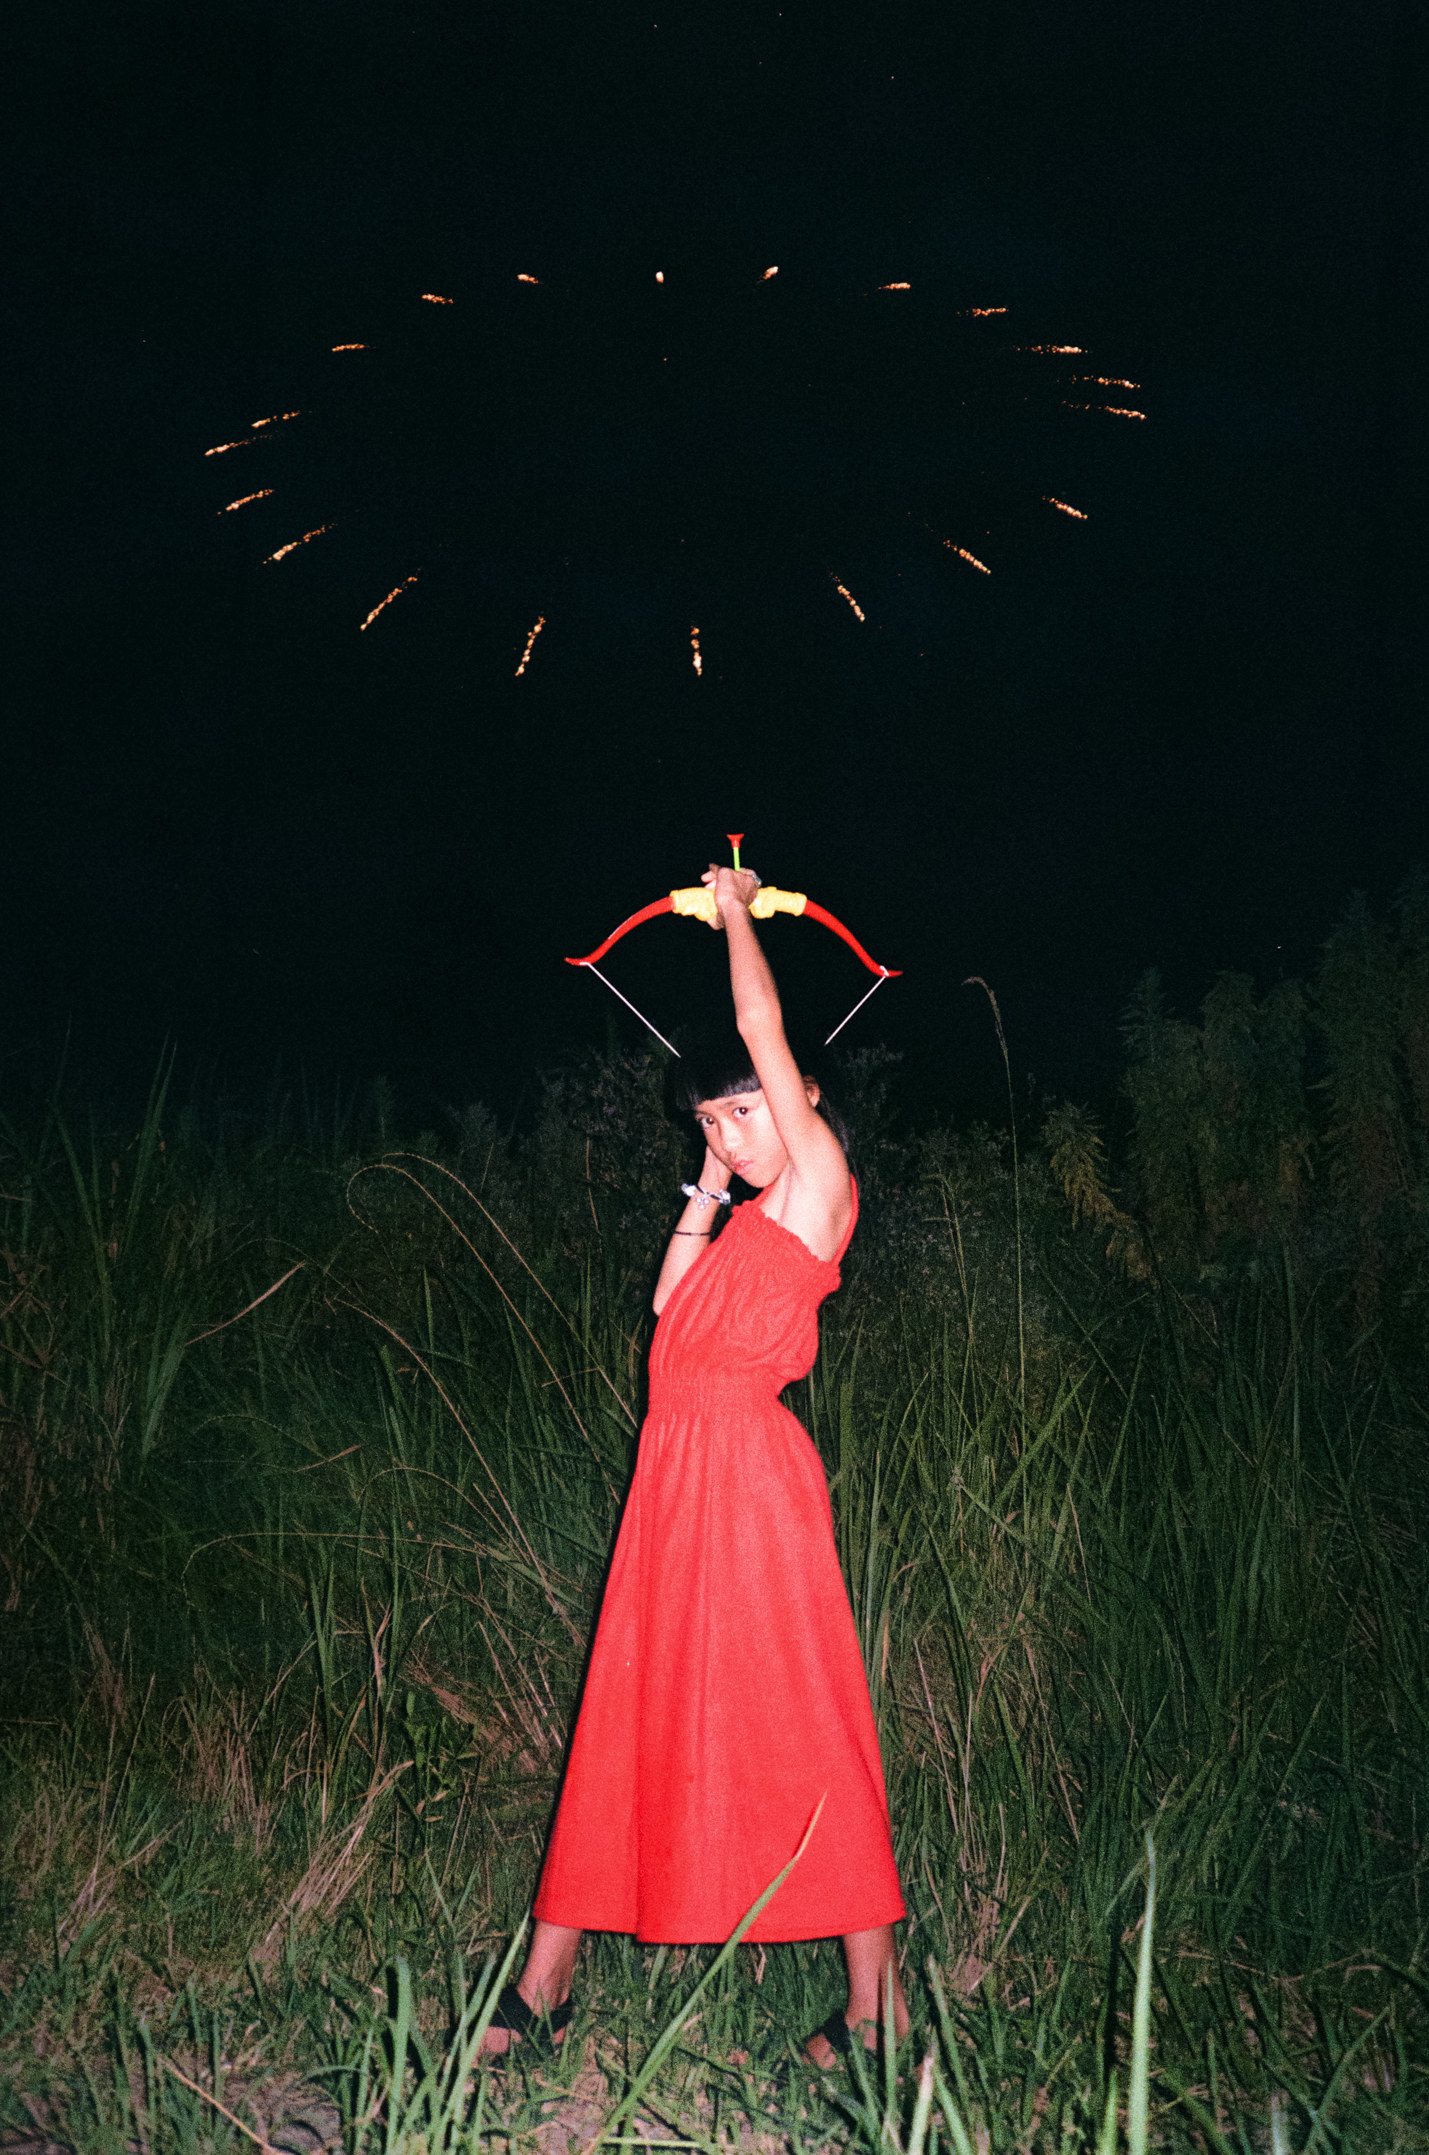 The photographer's daughter shooting an arrow upwards into fireworks